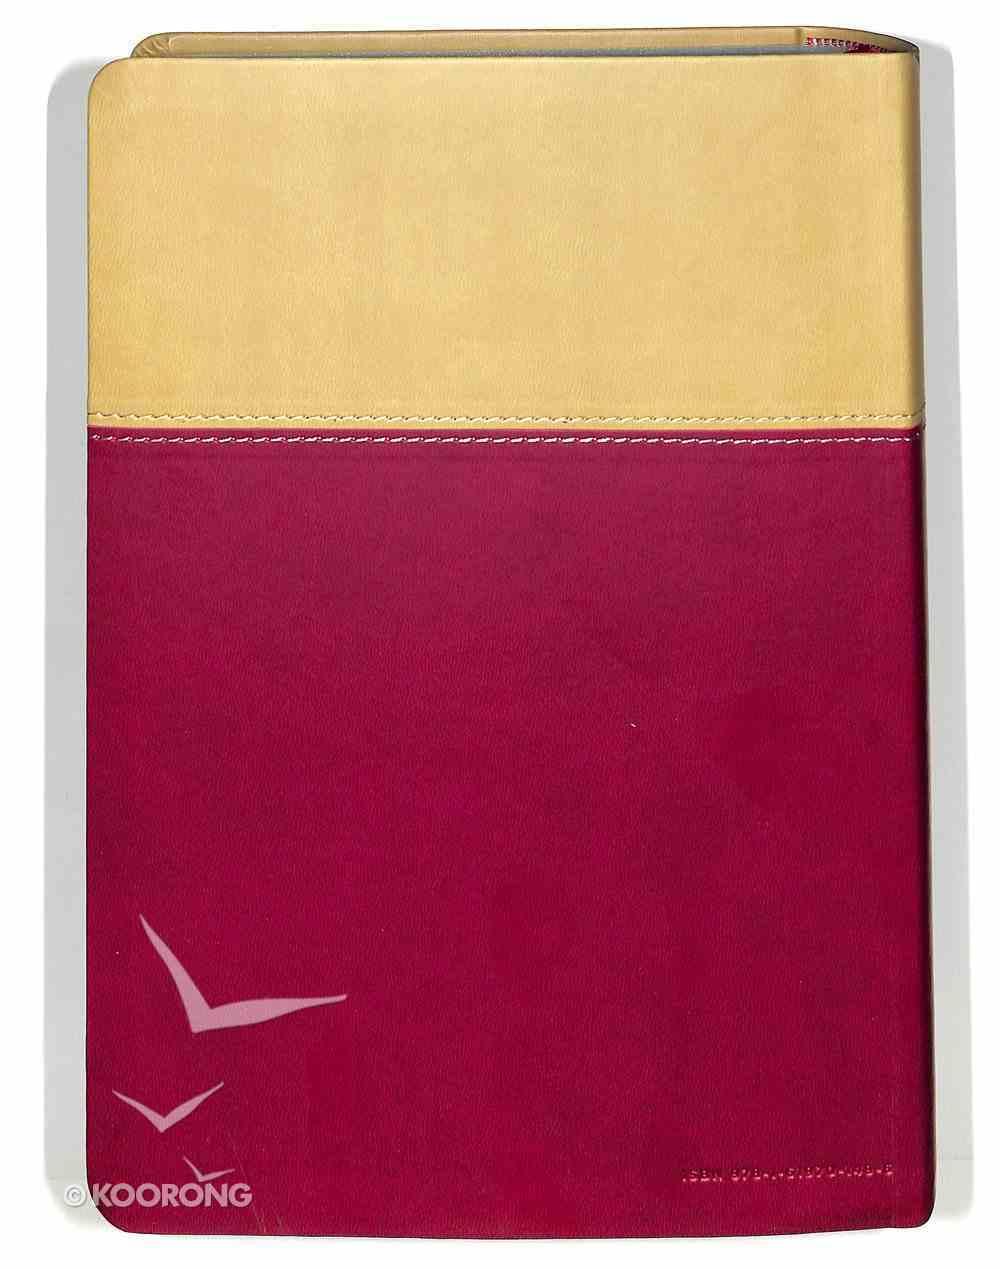 ESV Fire Study Bible Flexisoft Tan/Berry Premium Imitation Leather